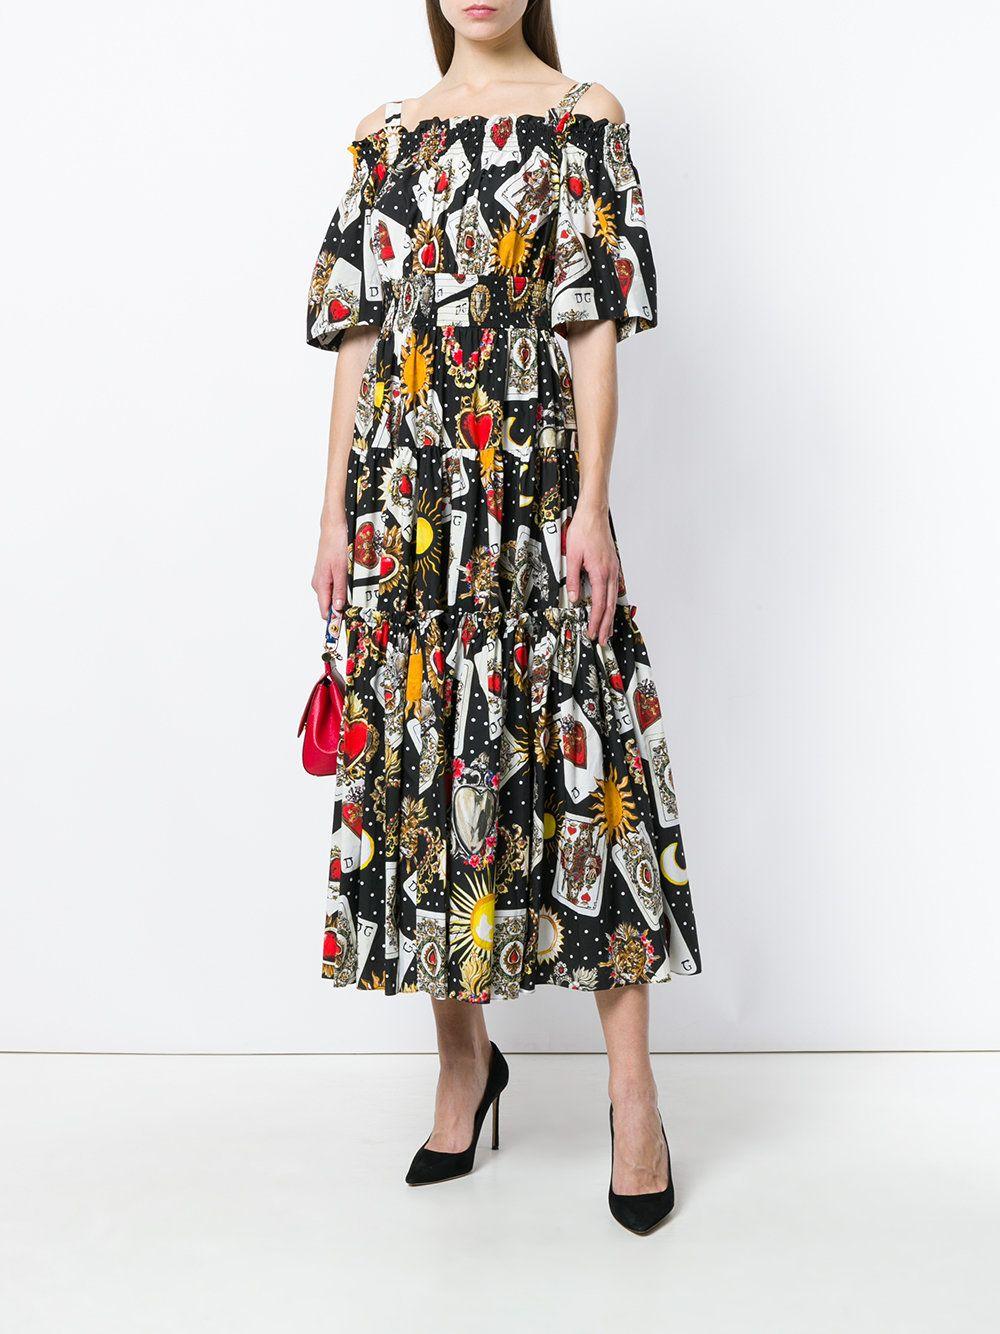 b90155037f5 Dolce n Gabbana playing card print dress